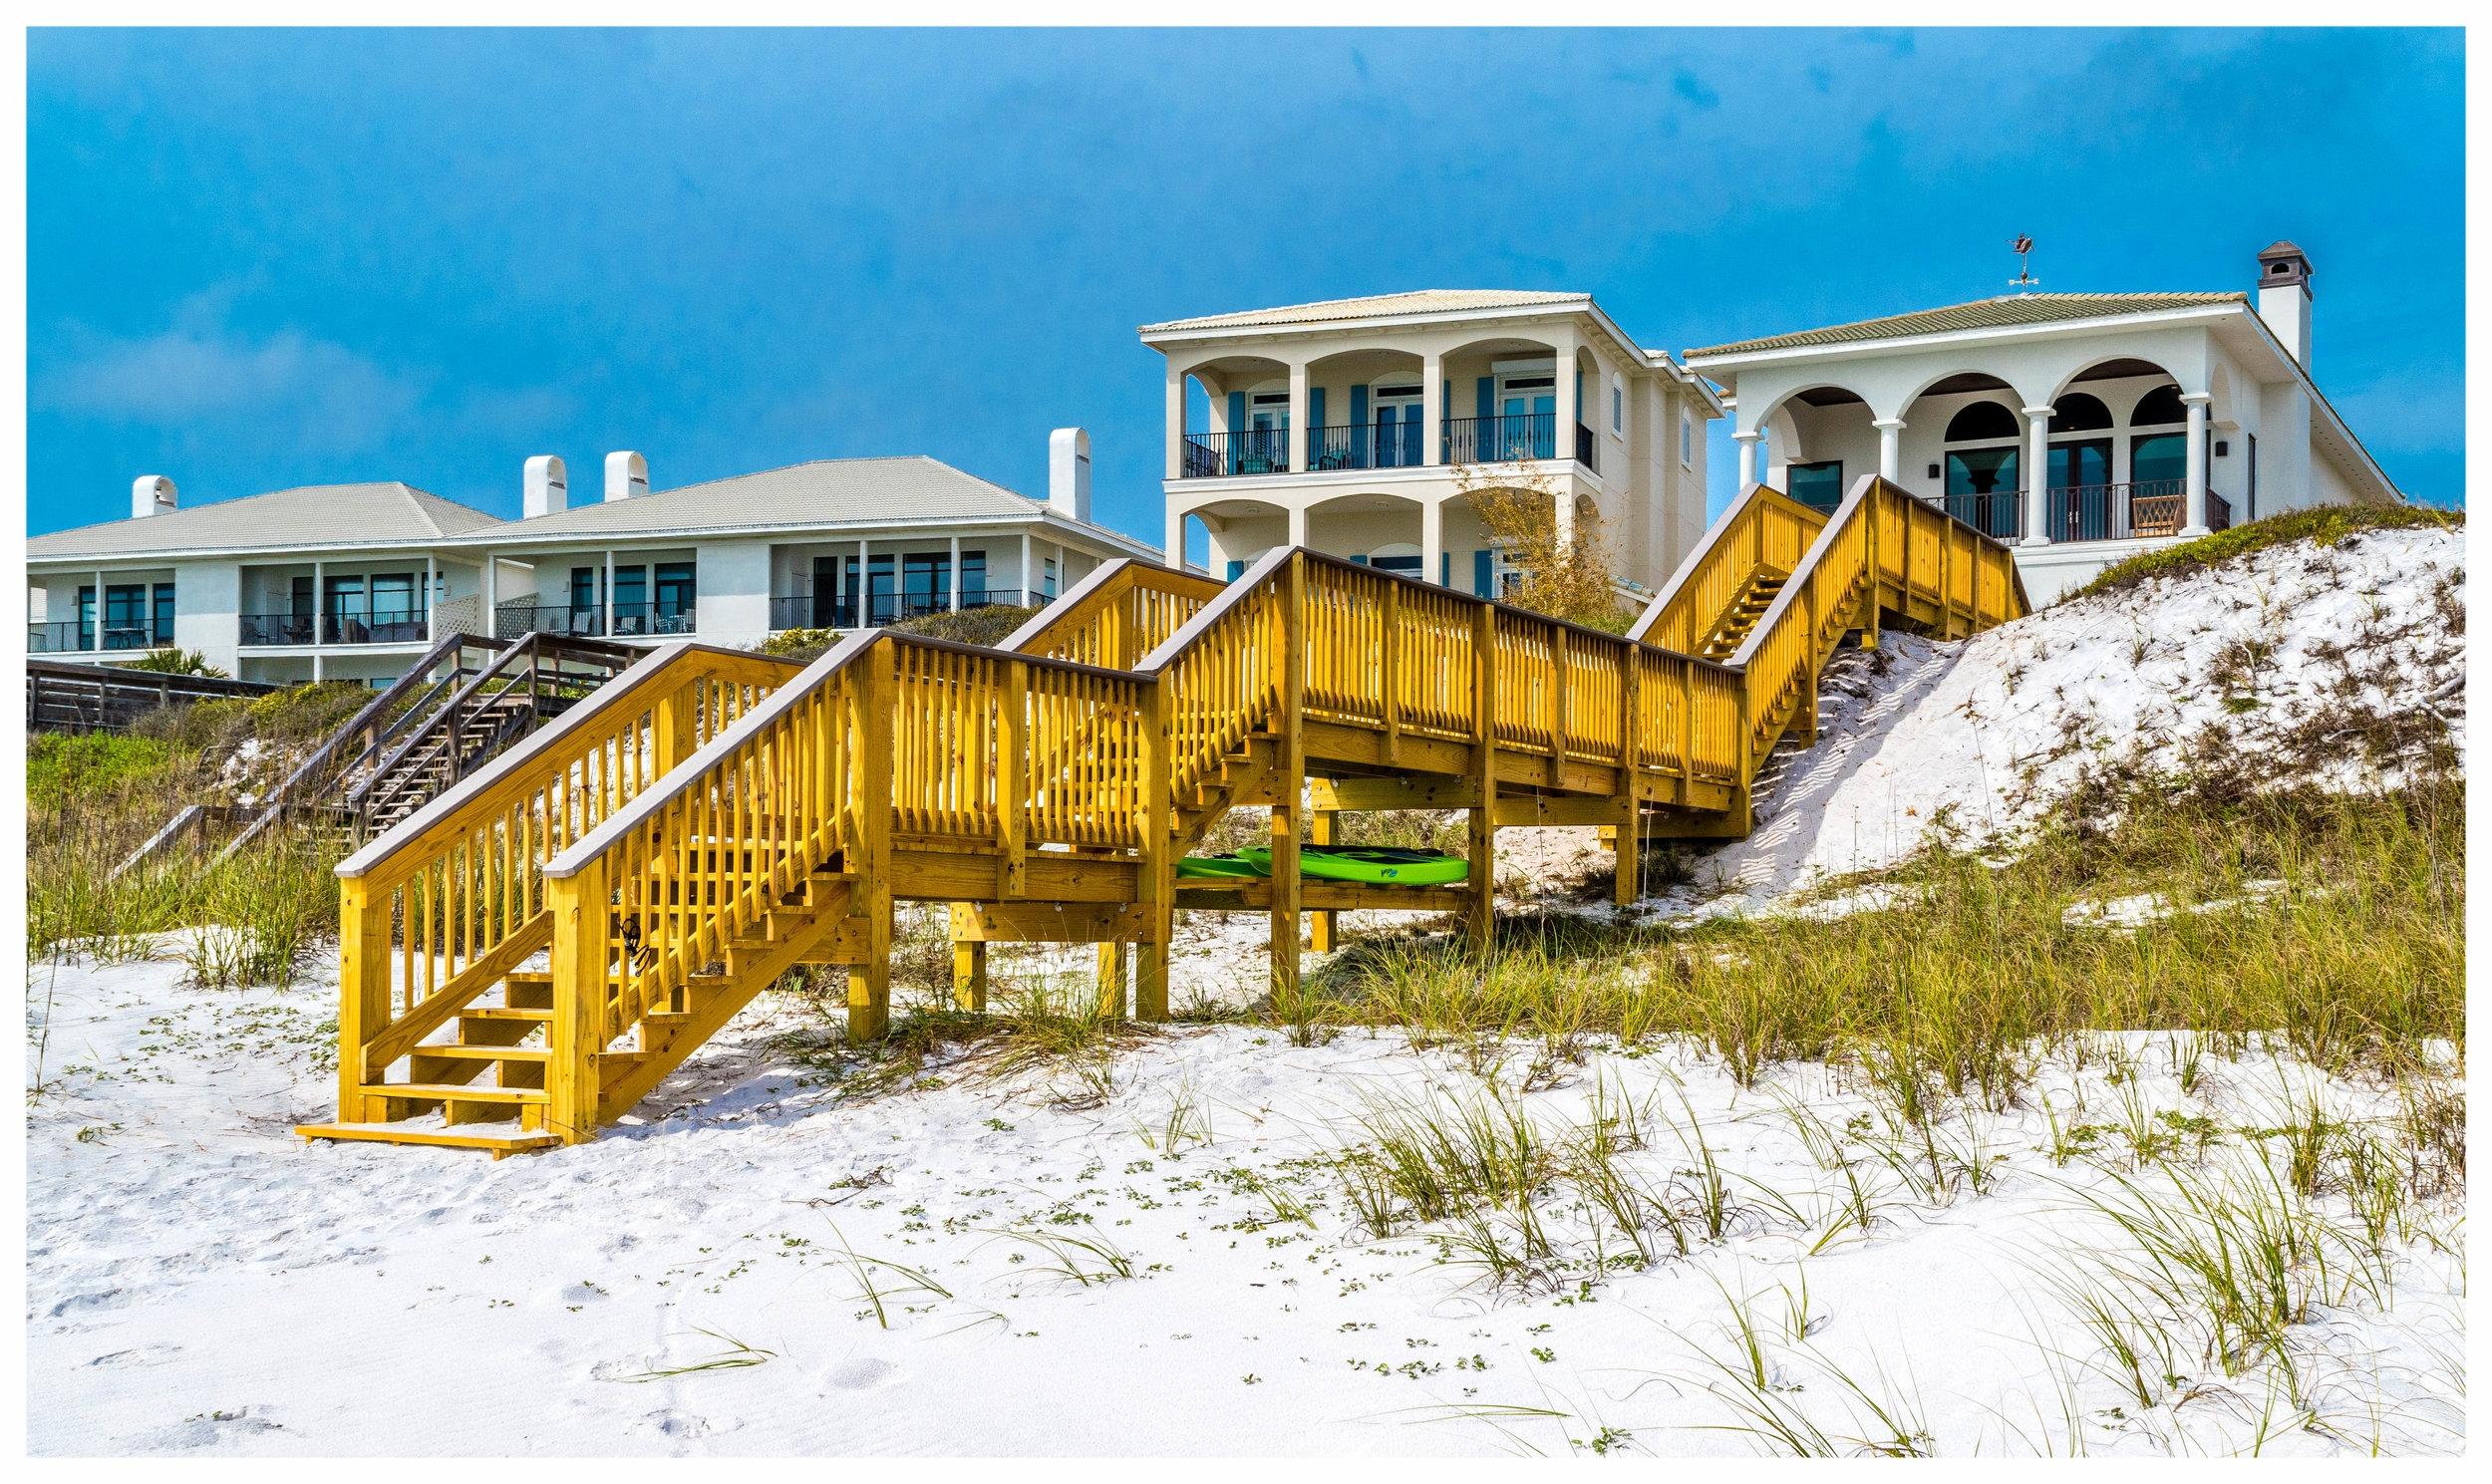 Boardwalk Design and Construction